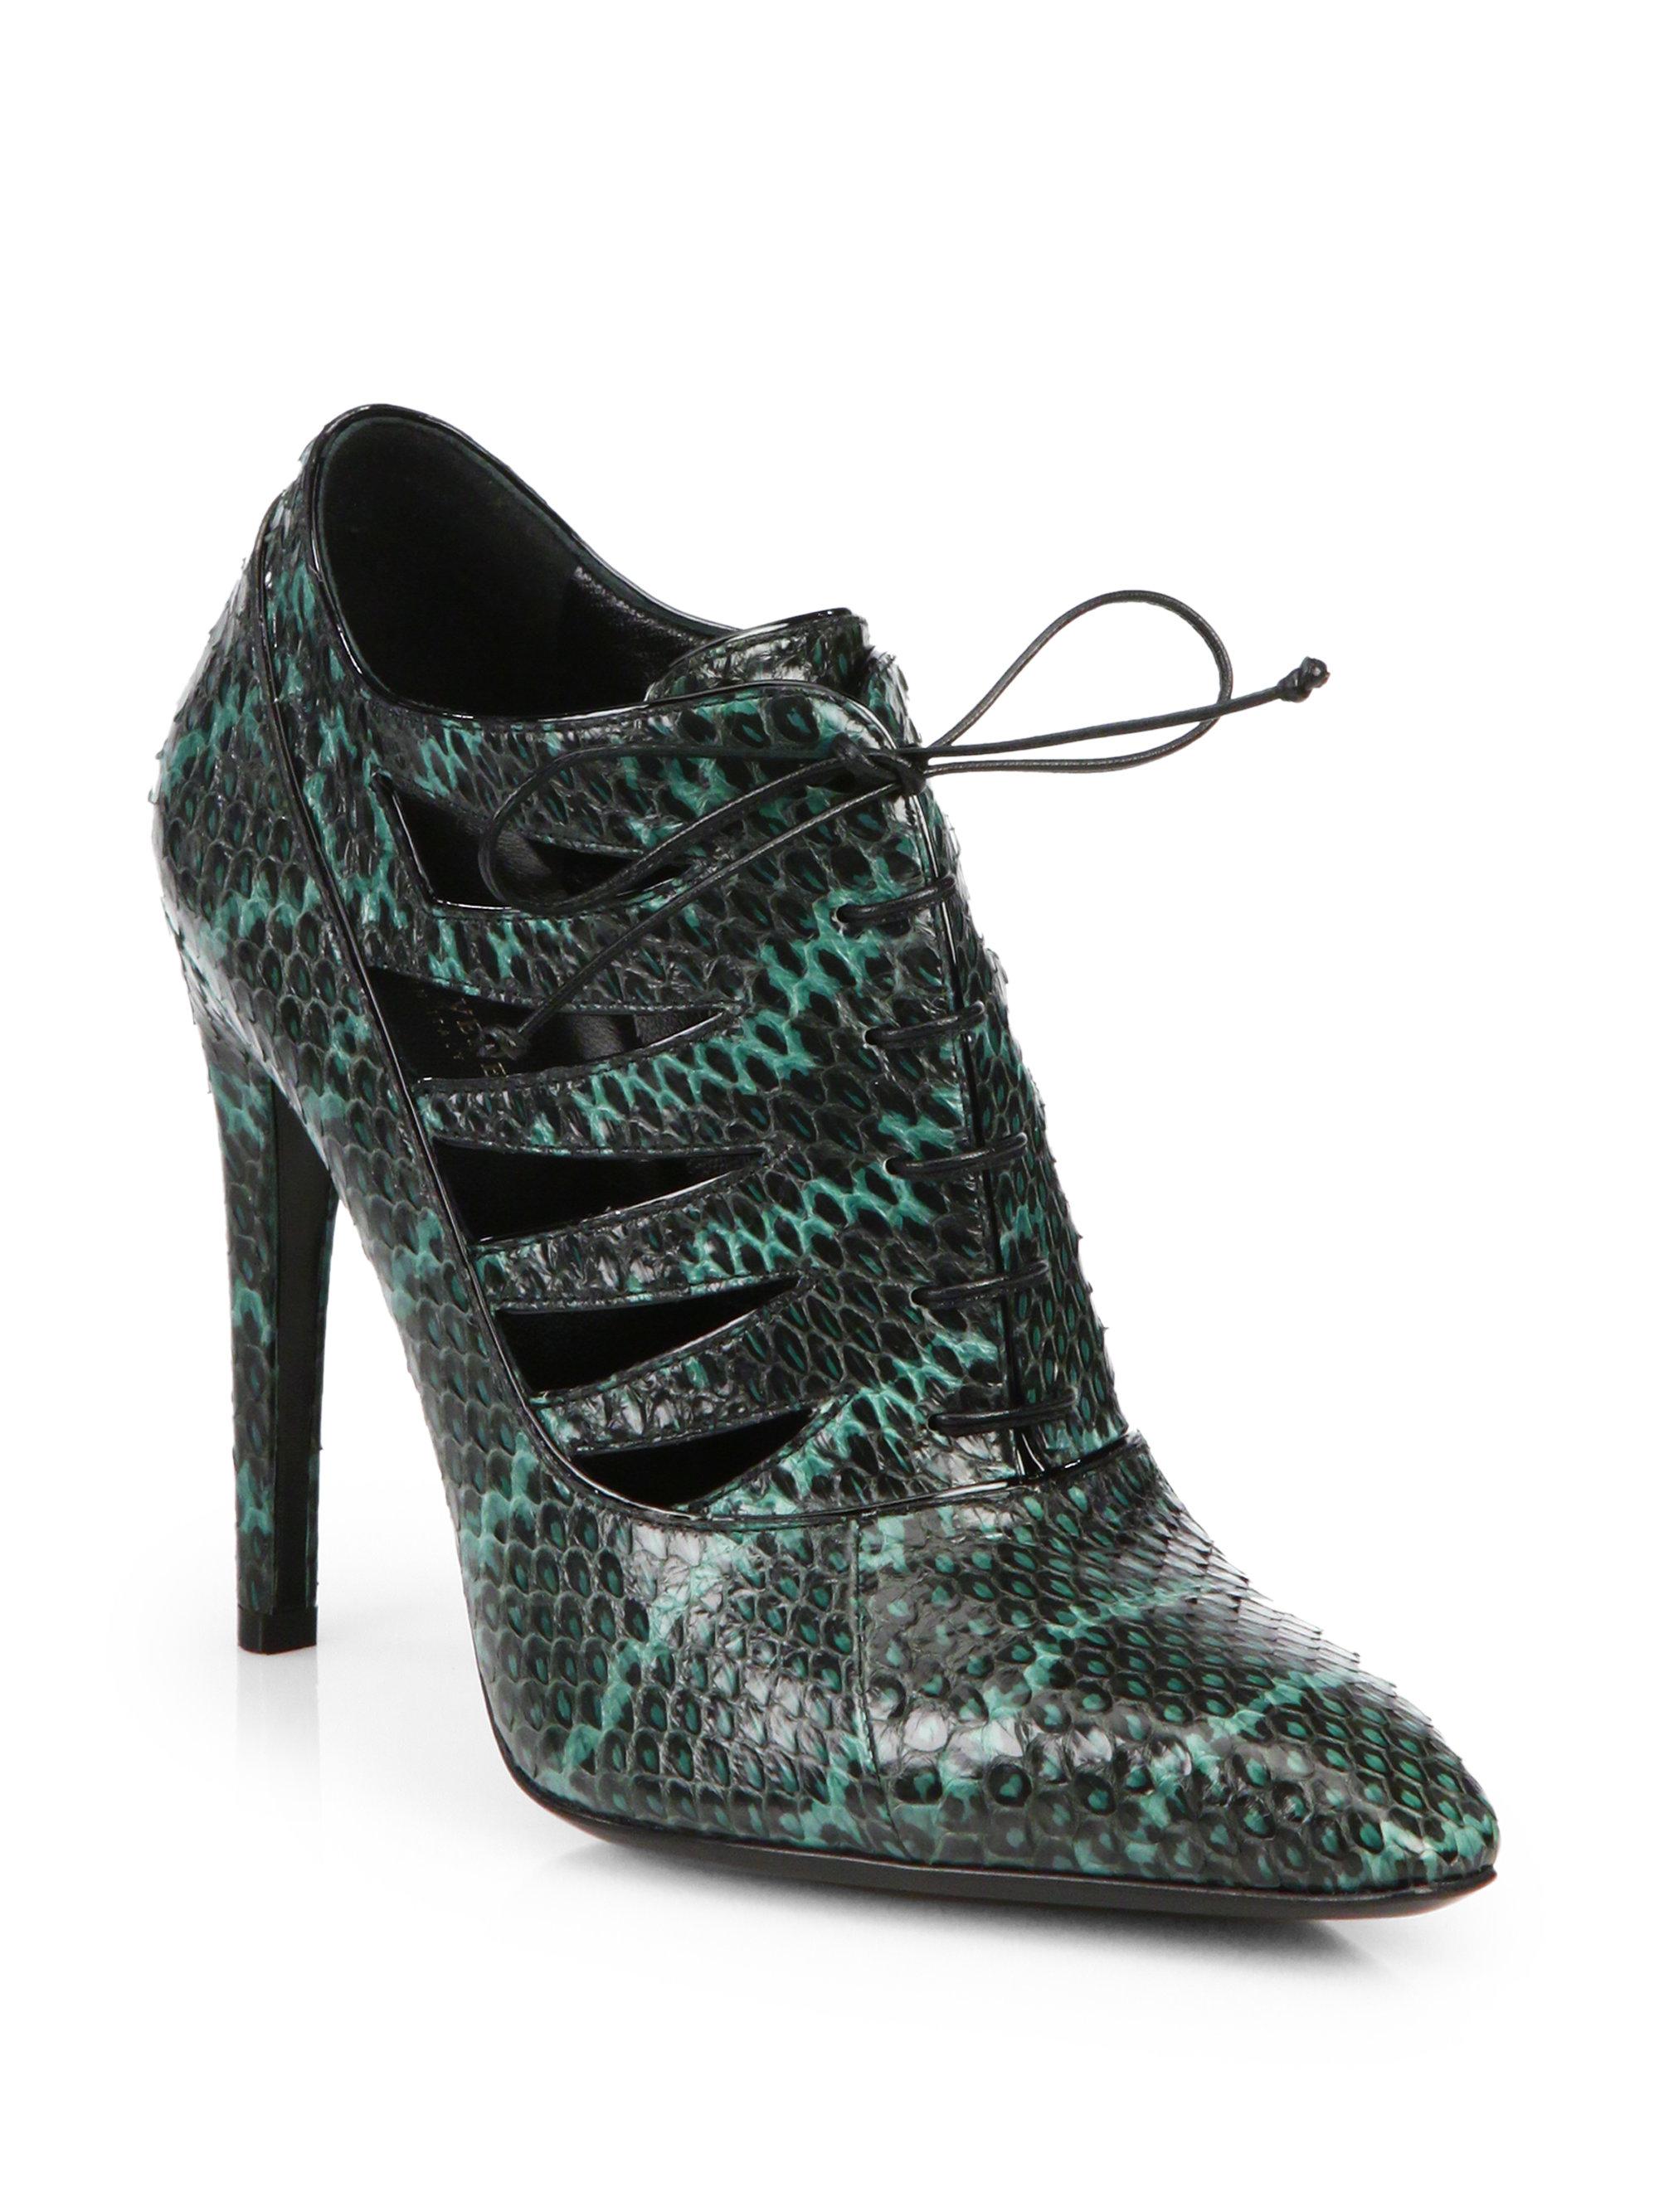 cheap sale store Bottega Veneta Suede & Snakeskin Ankle Boots sast cheap price fwUCM3k35